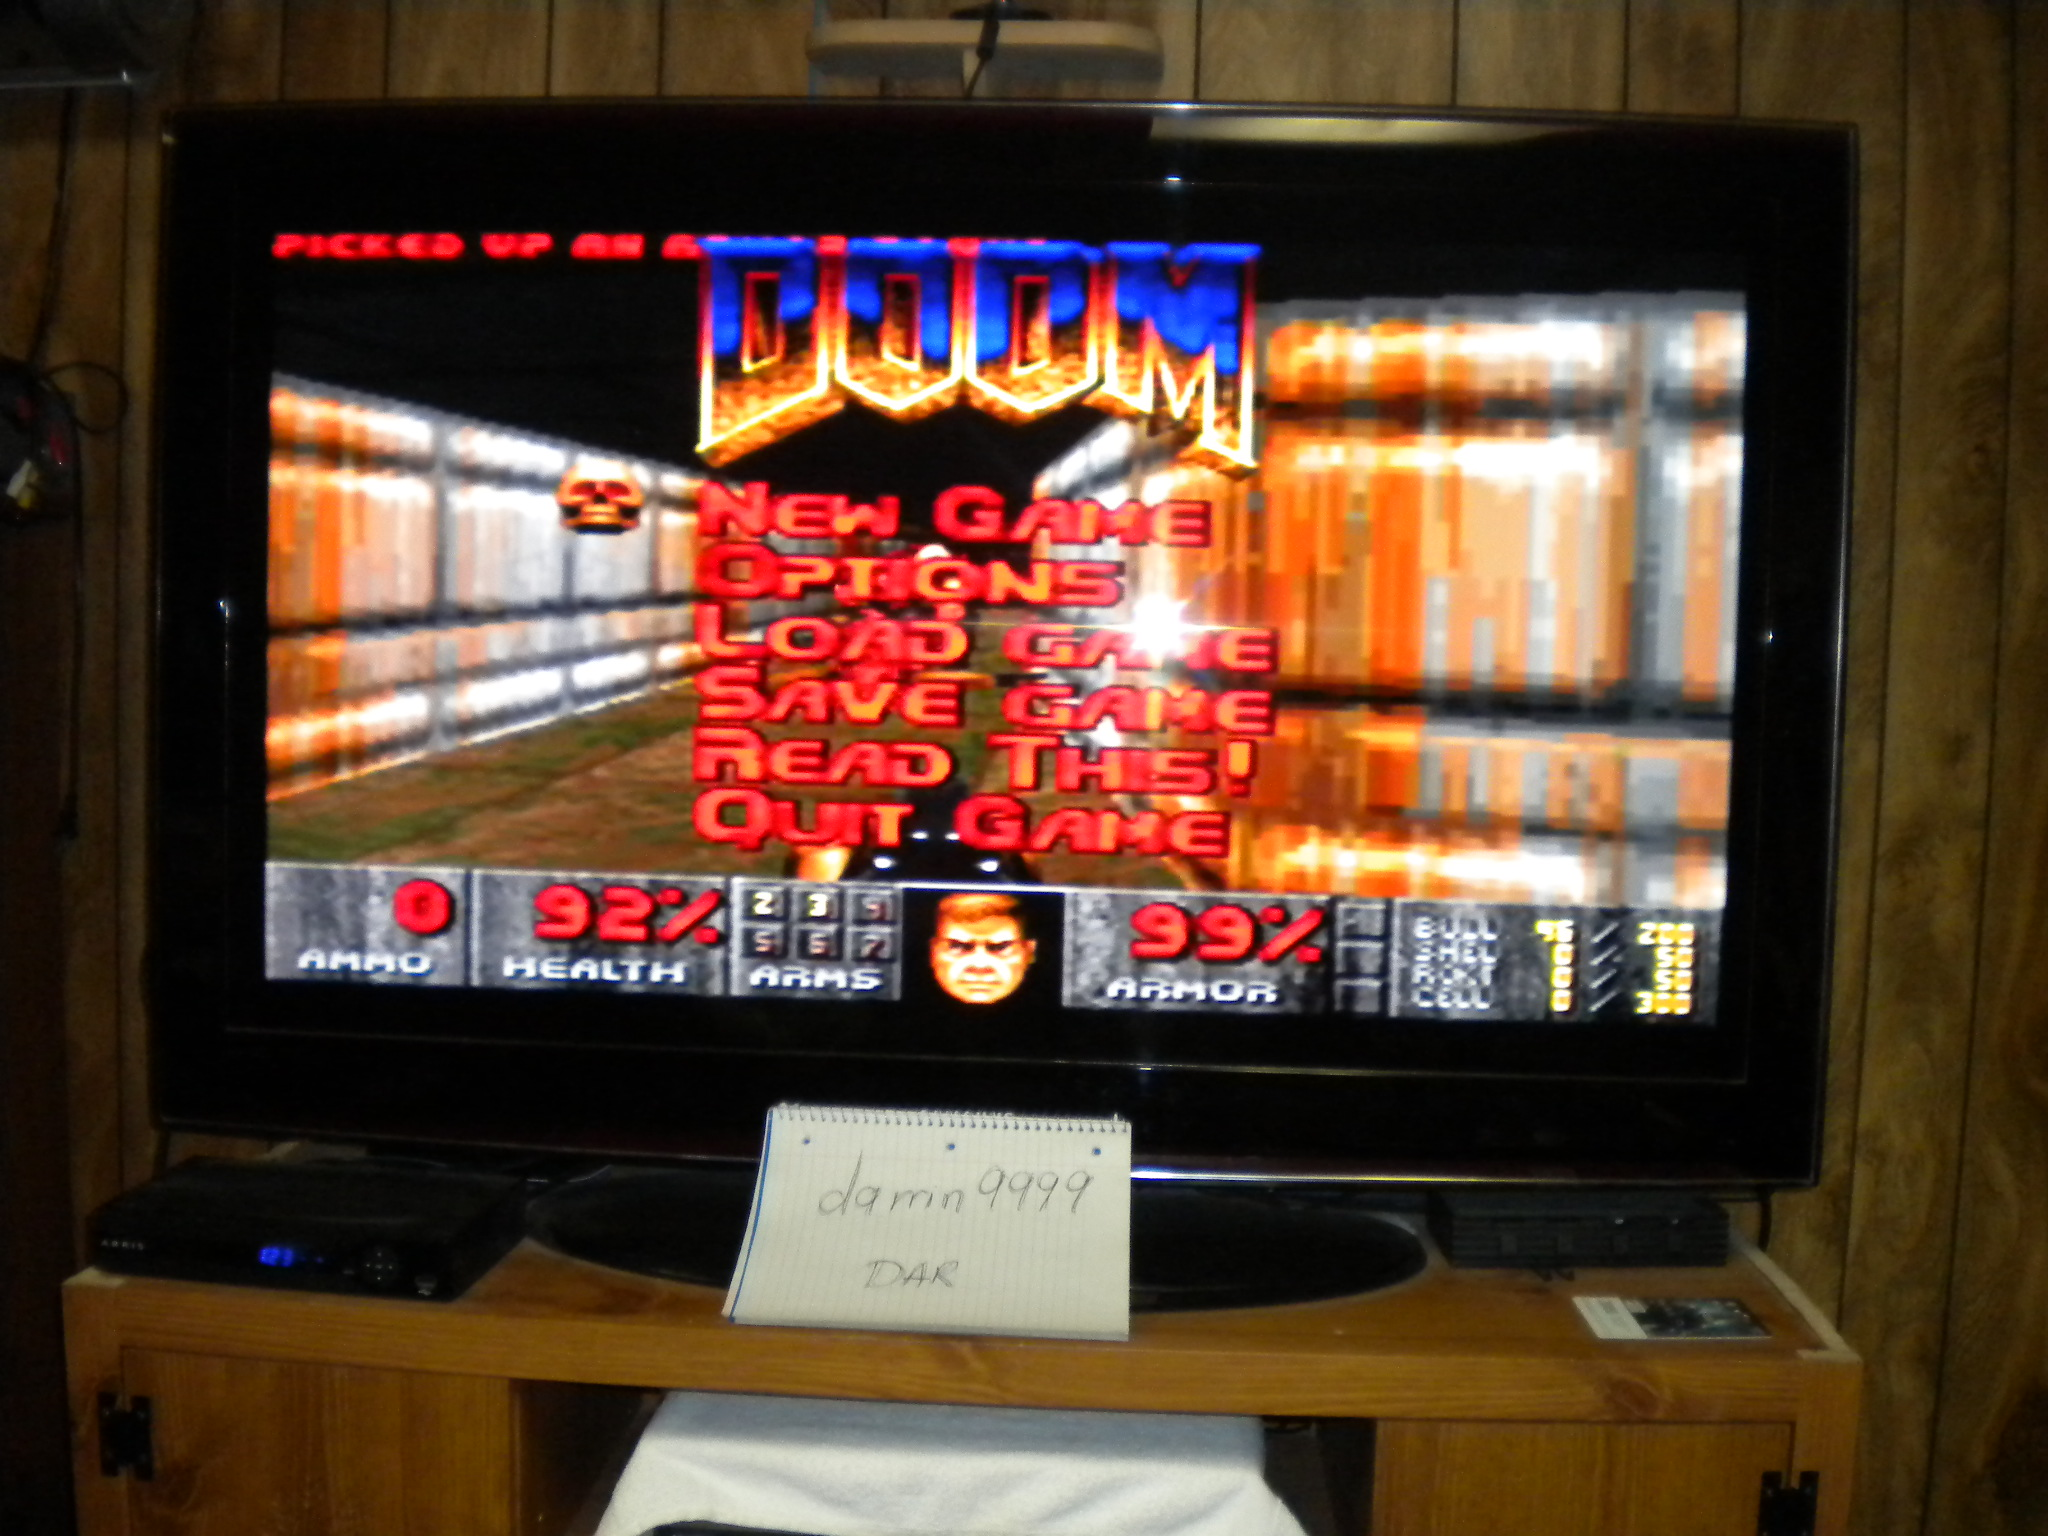 Doom: Hanger time of 0:07:16